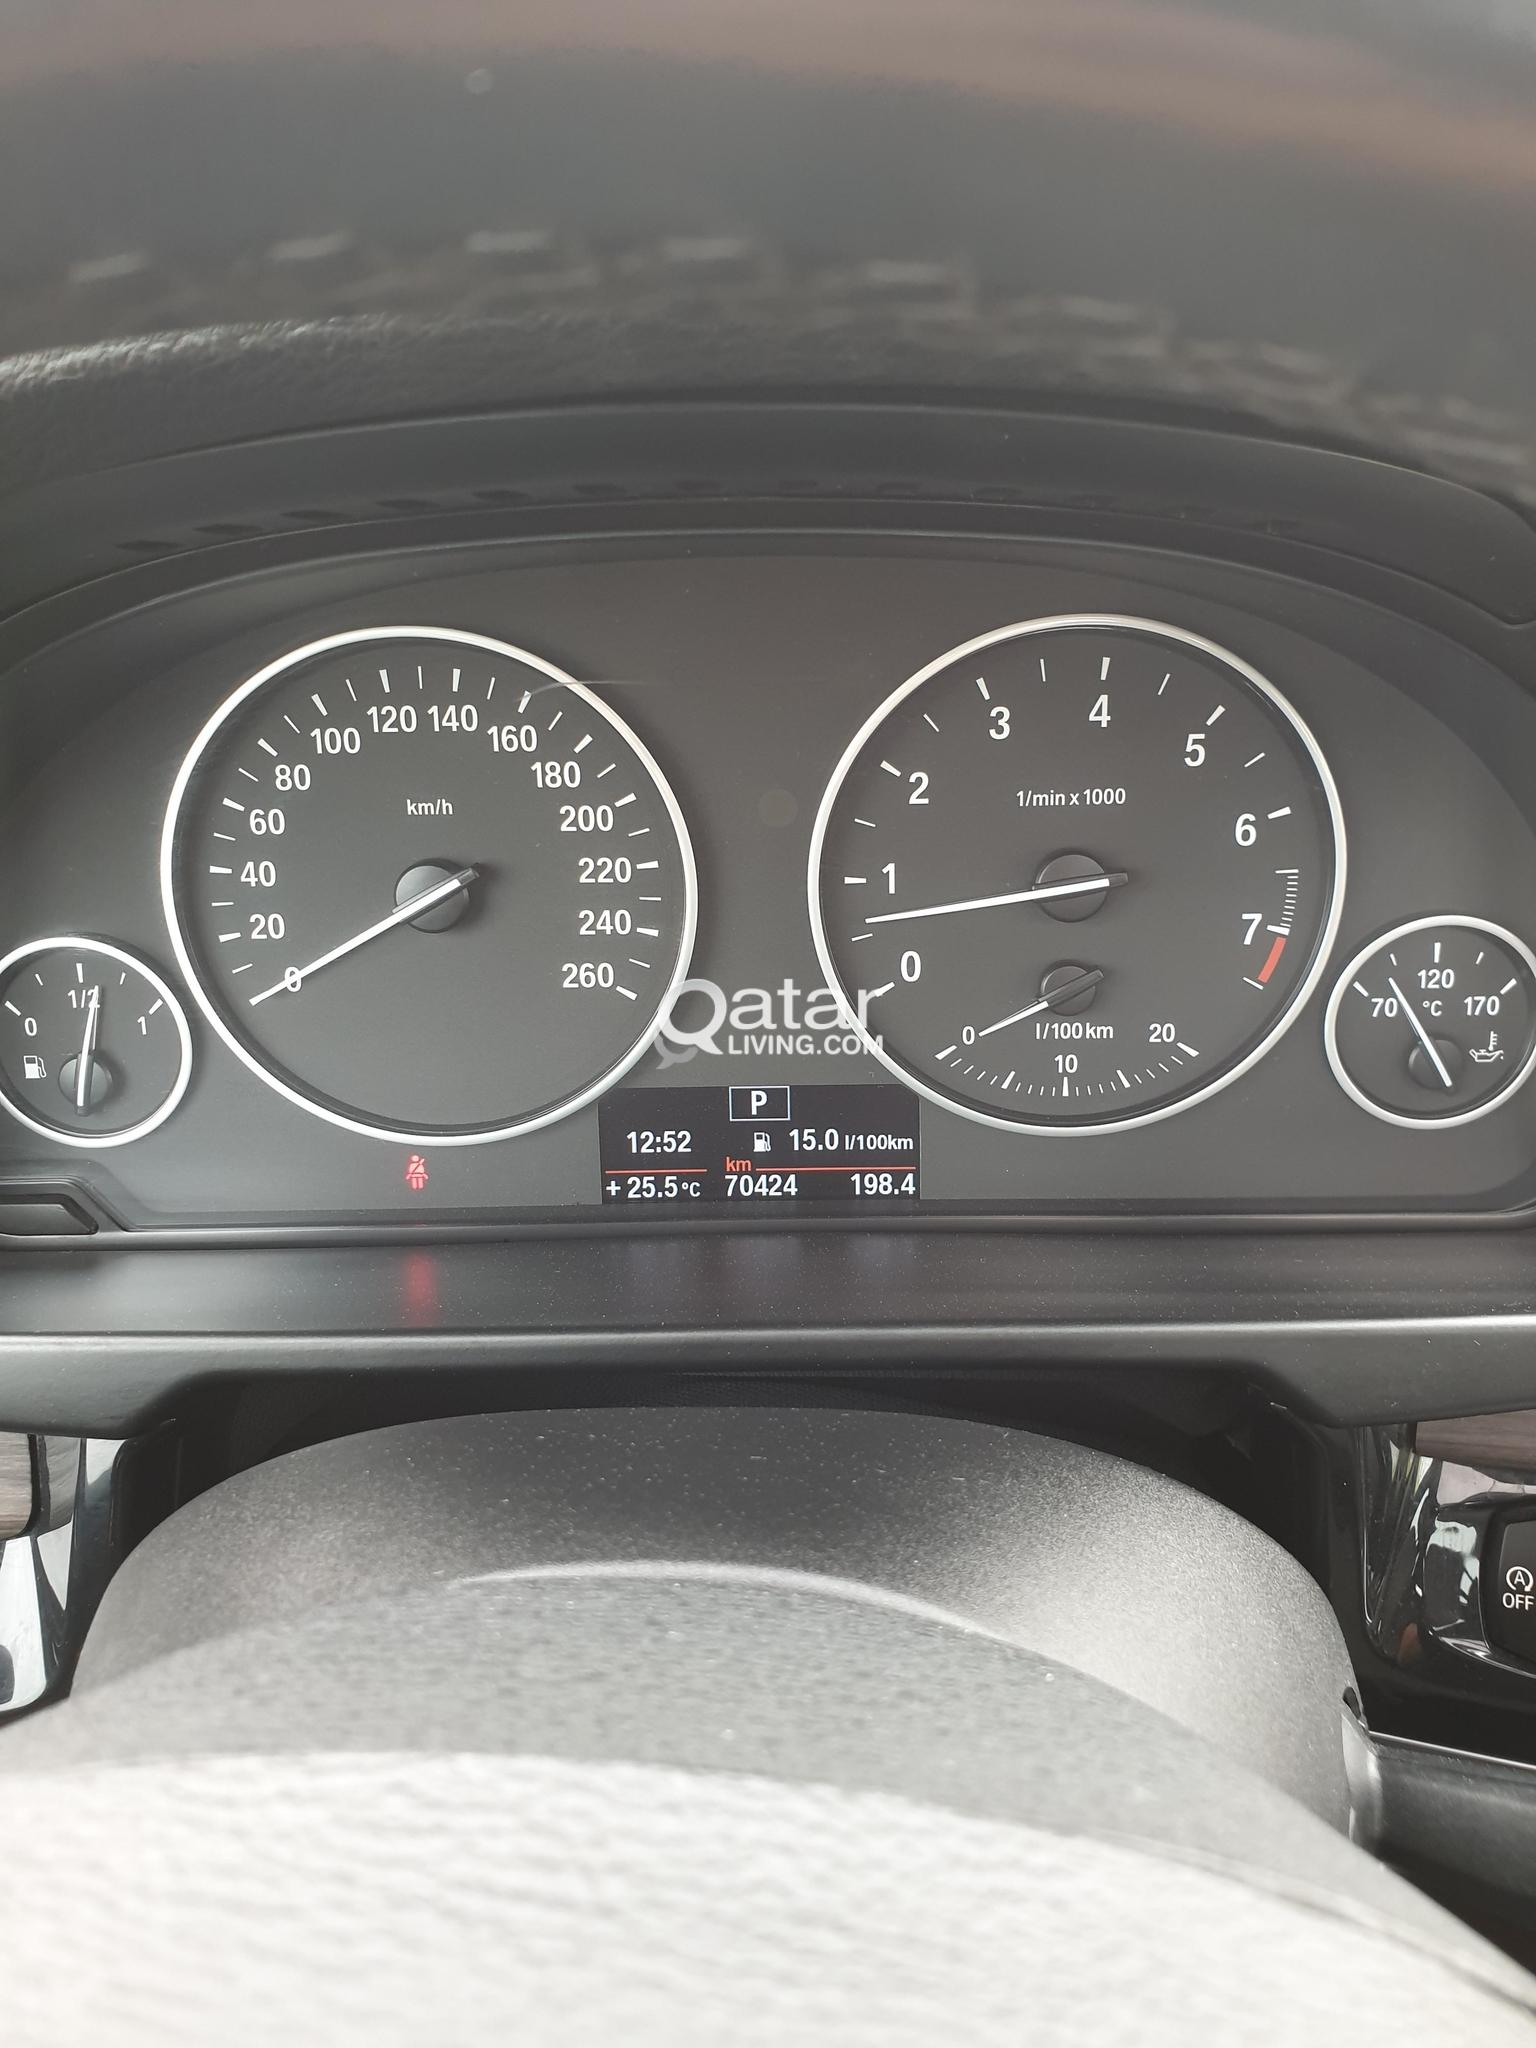 BMW x5 3.5i 2014 Excellent Condition